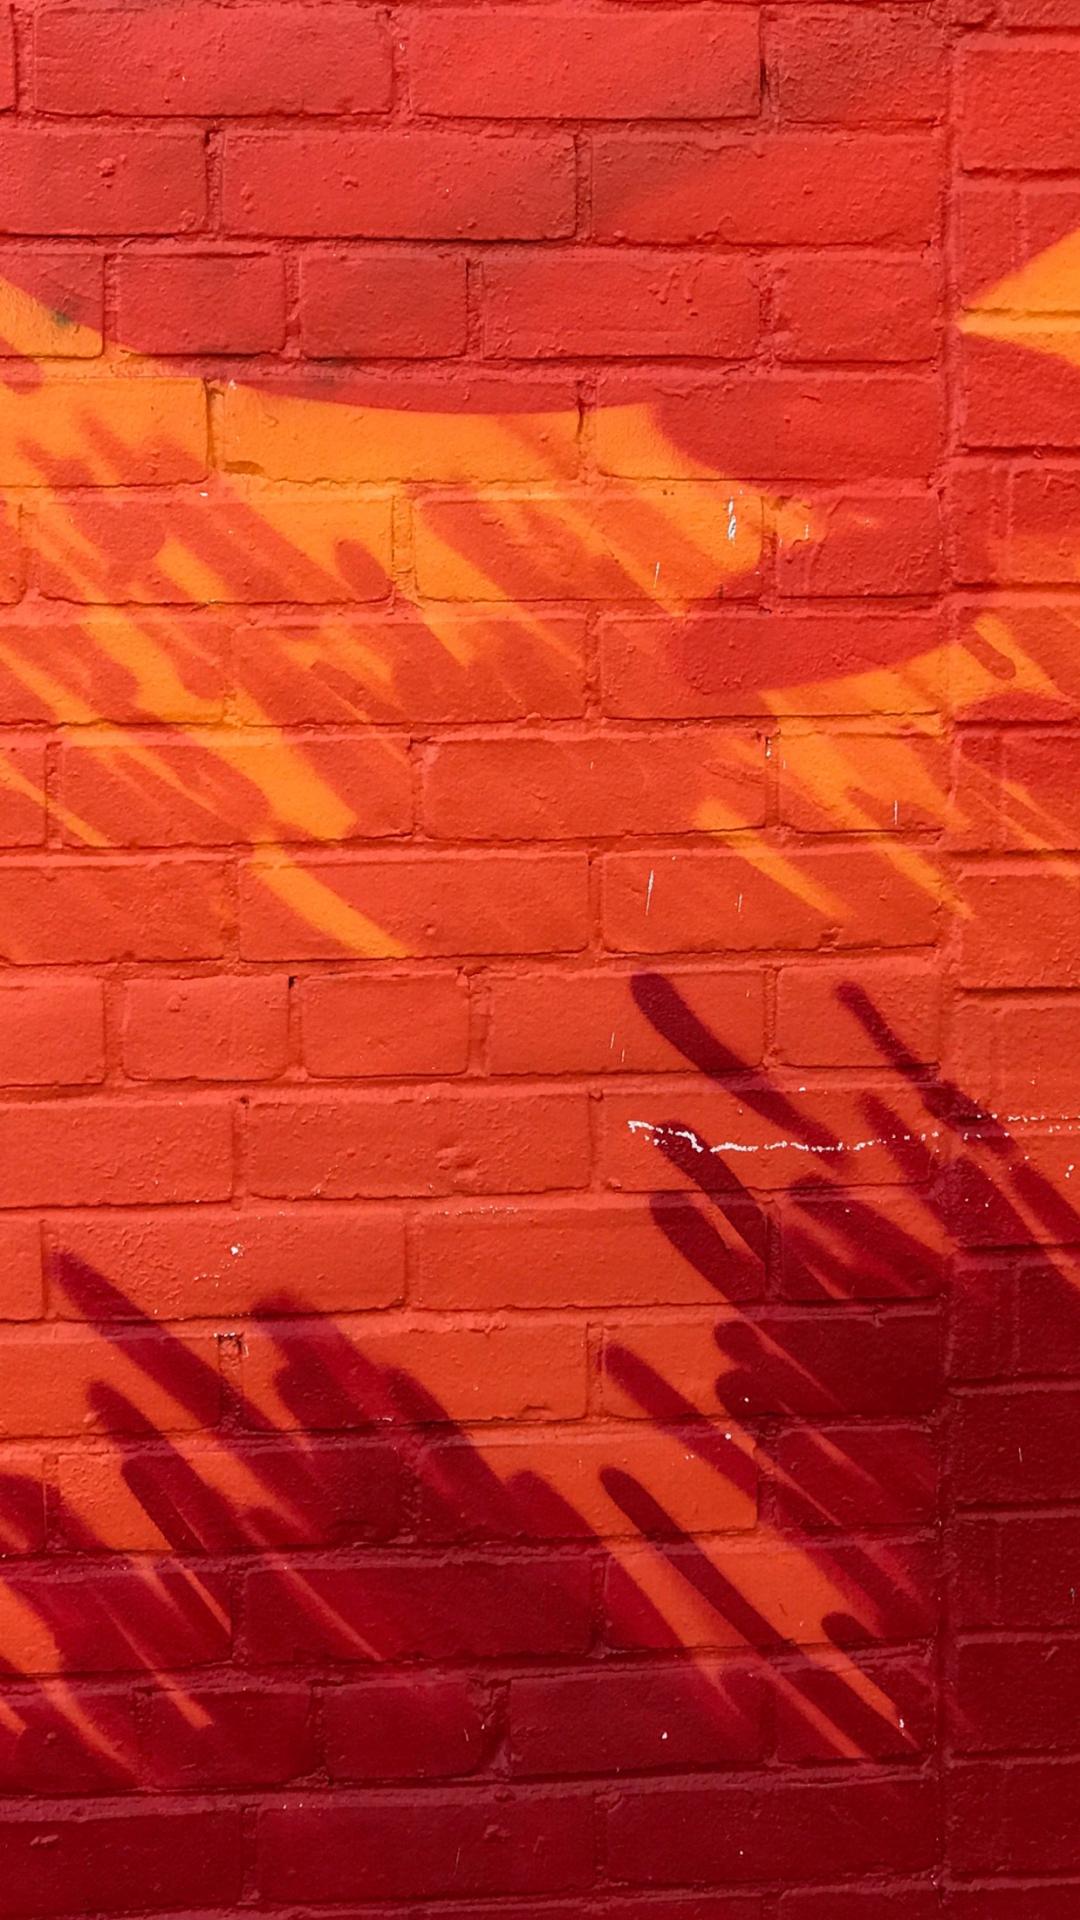 Painted Brick Wall iPhone Wallpaper